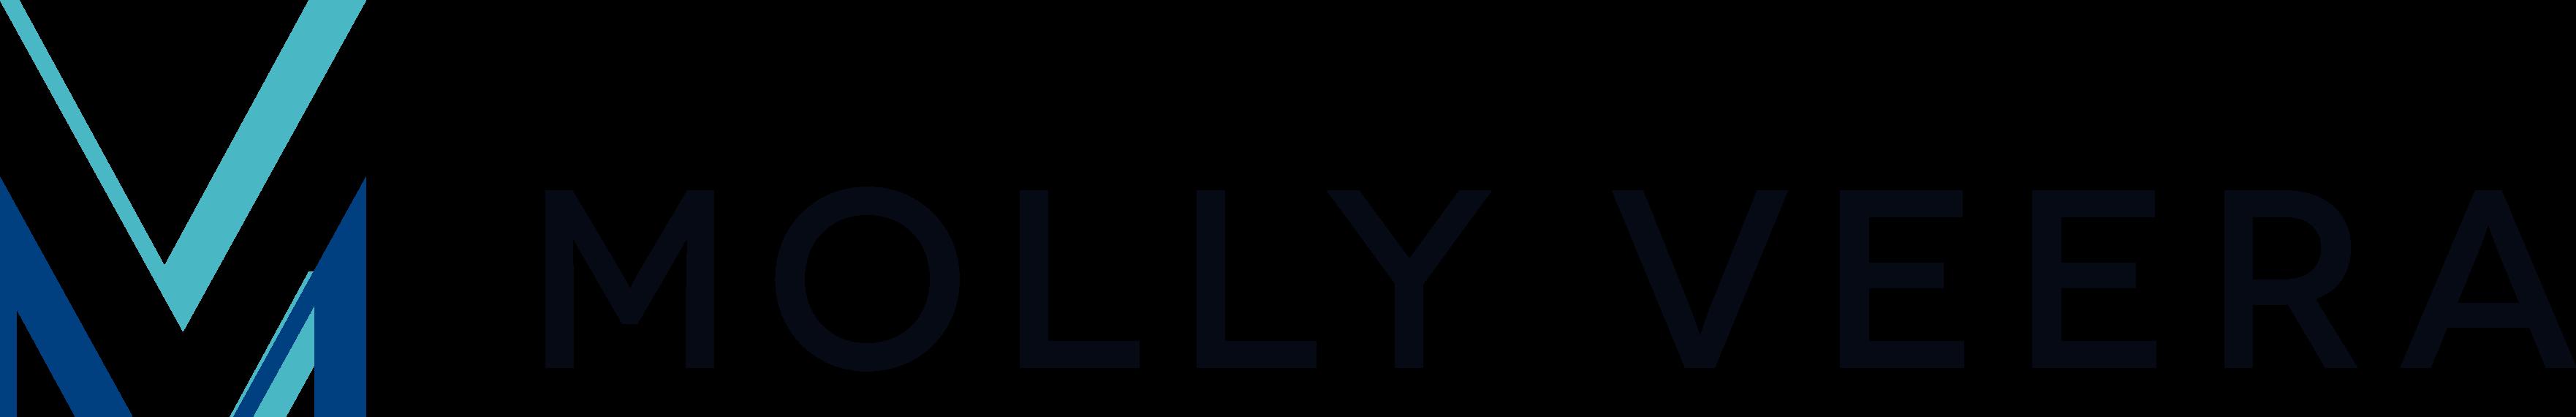 Los Angeles Luxury Real Estate Agent Needs New Logo